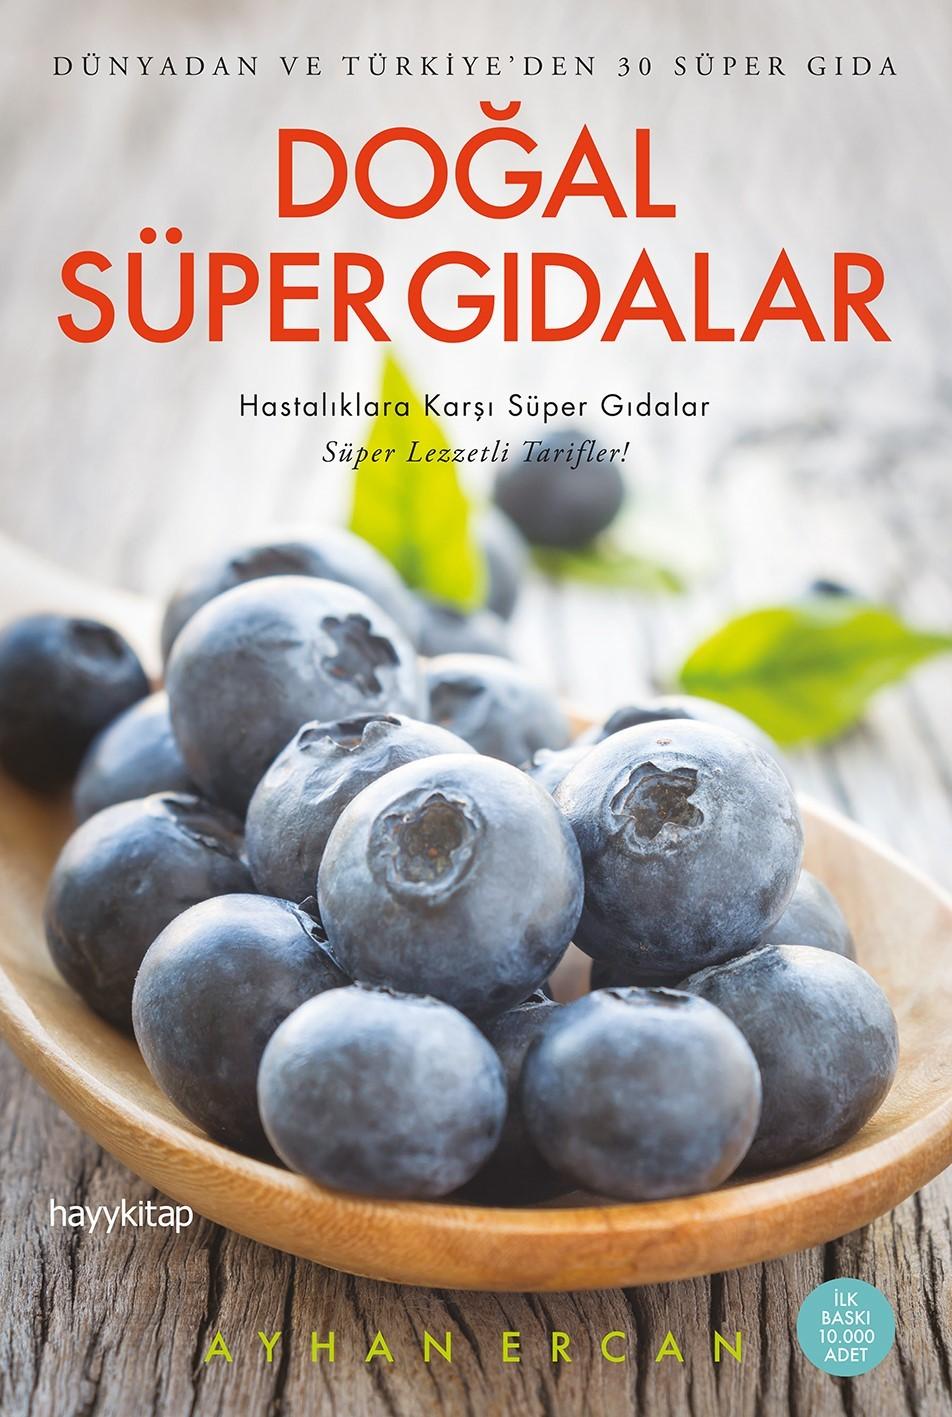 Doğal Süper Gıdalar  Ayhan Ercan HAYY KİTAP